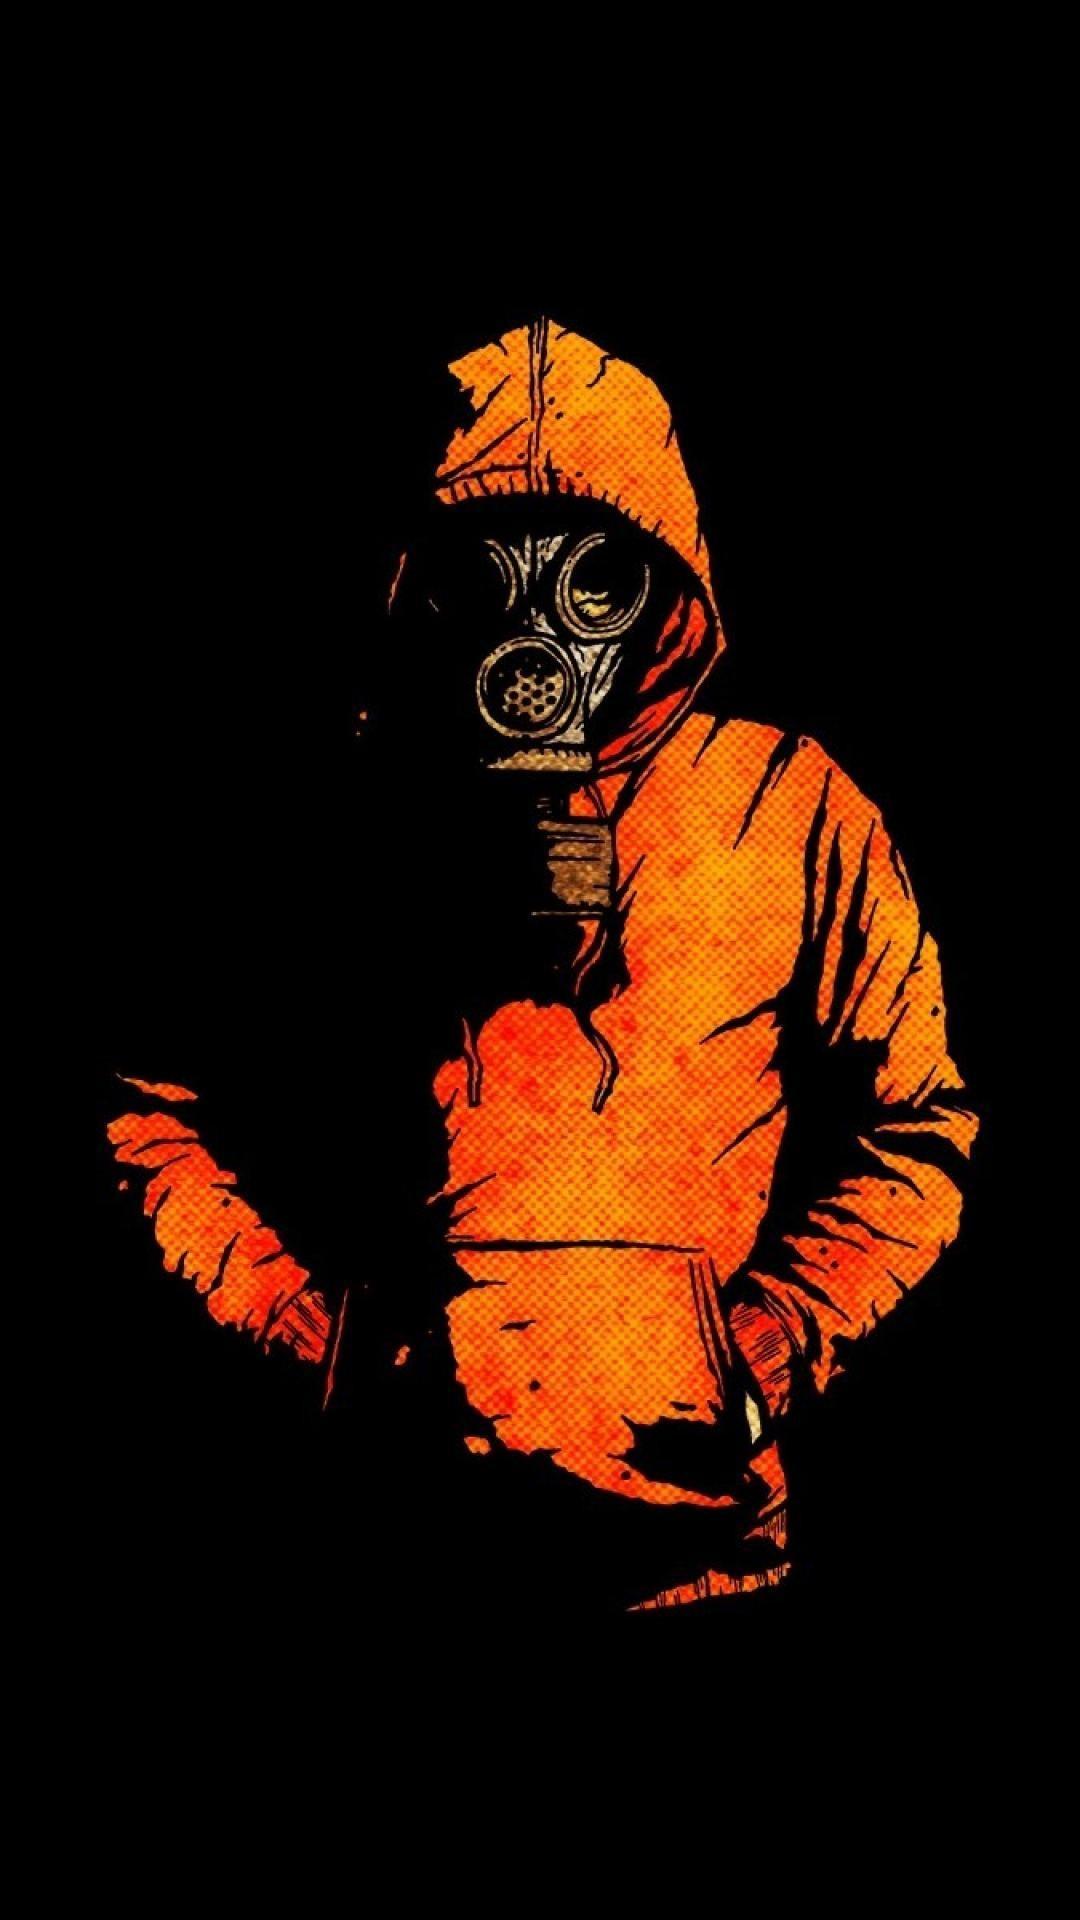 Iphone Black Orange Wallpapers Wallpaper Cave